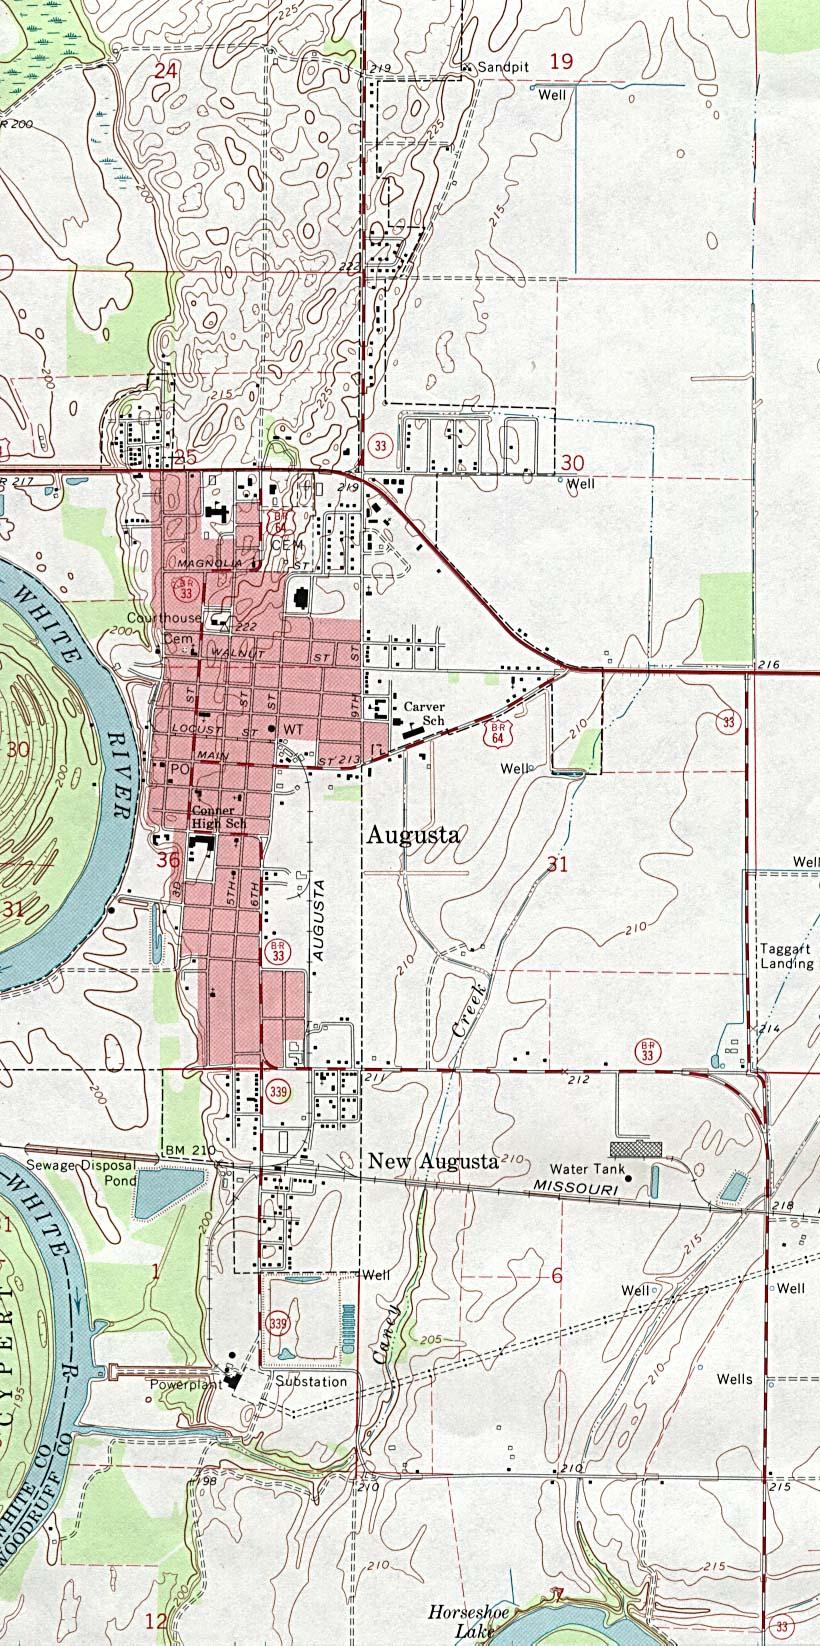 Augusta Topographic City Map, Arkansas, United States